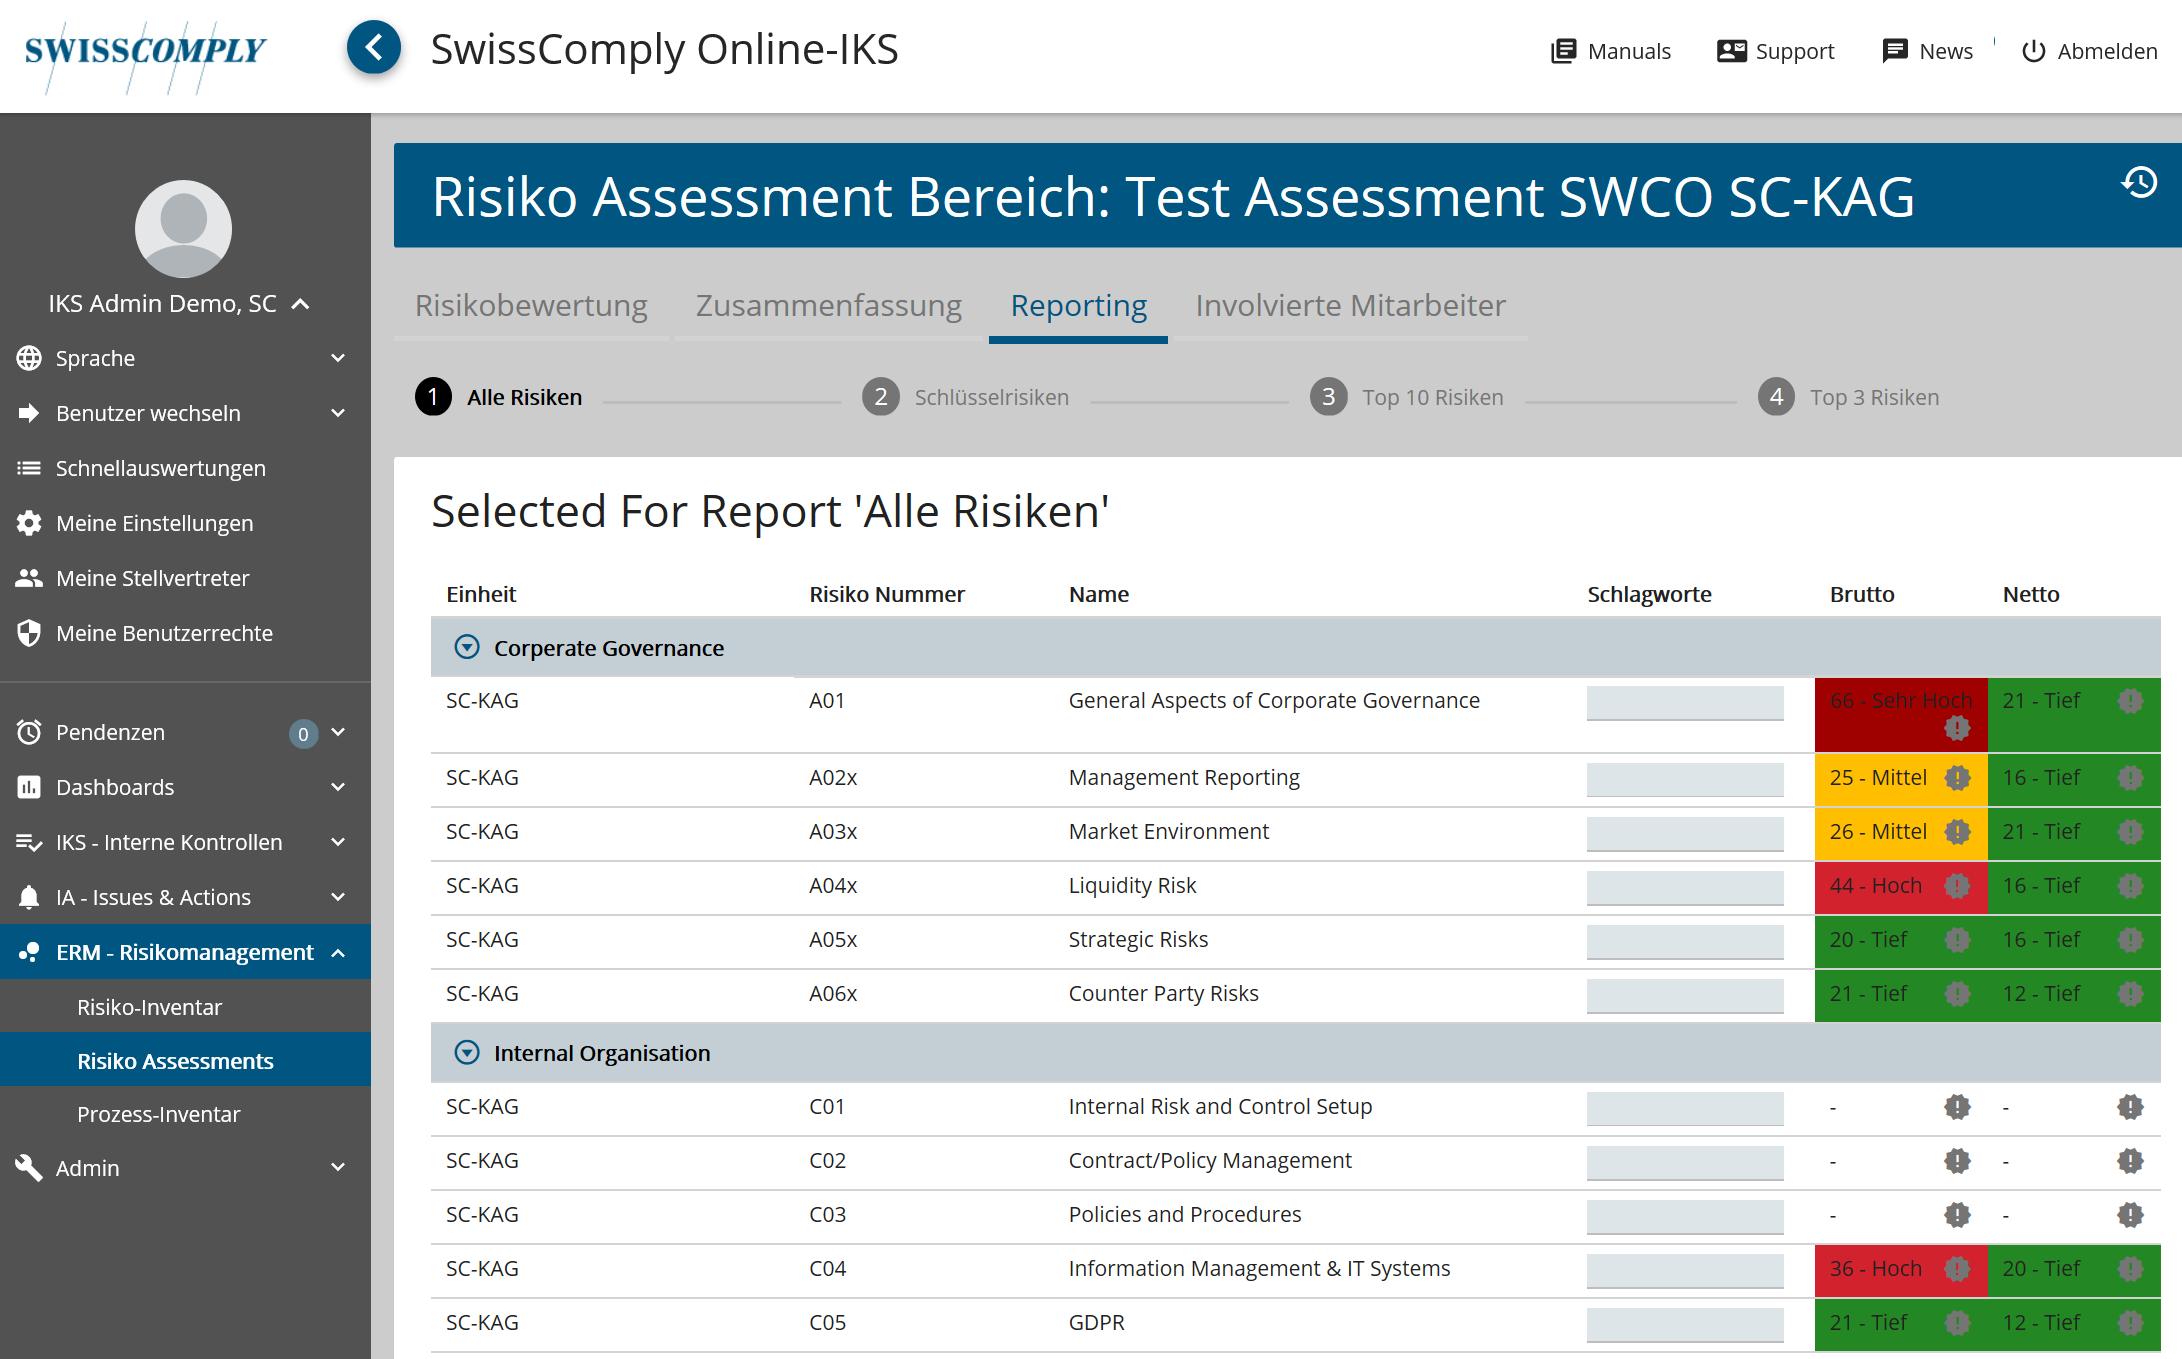 Online-IKS Assessment